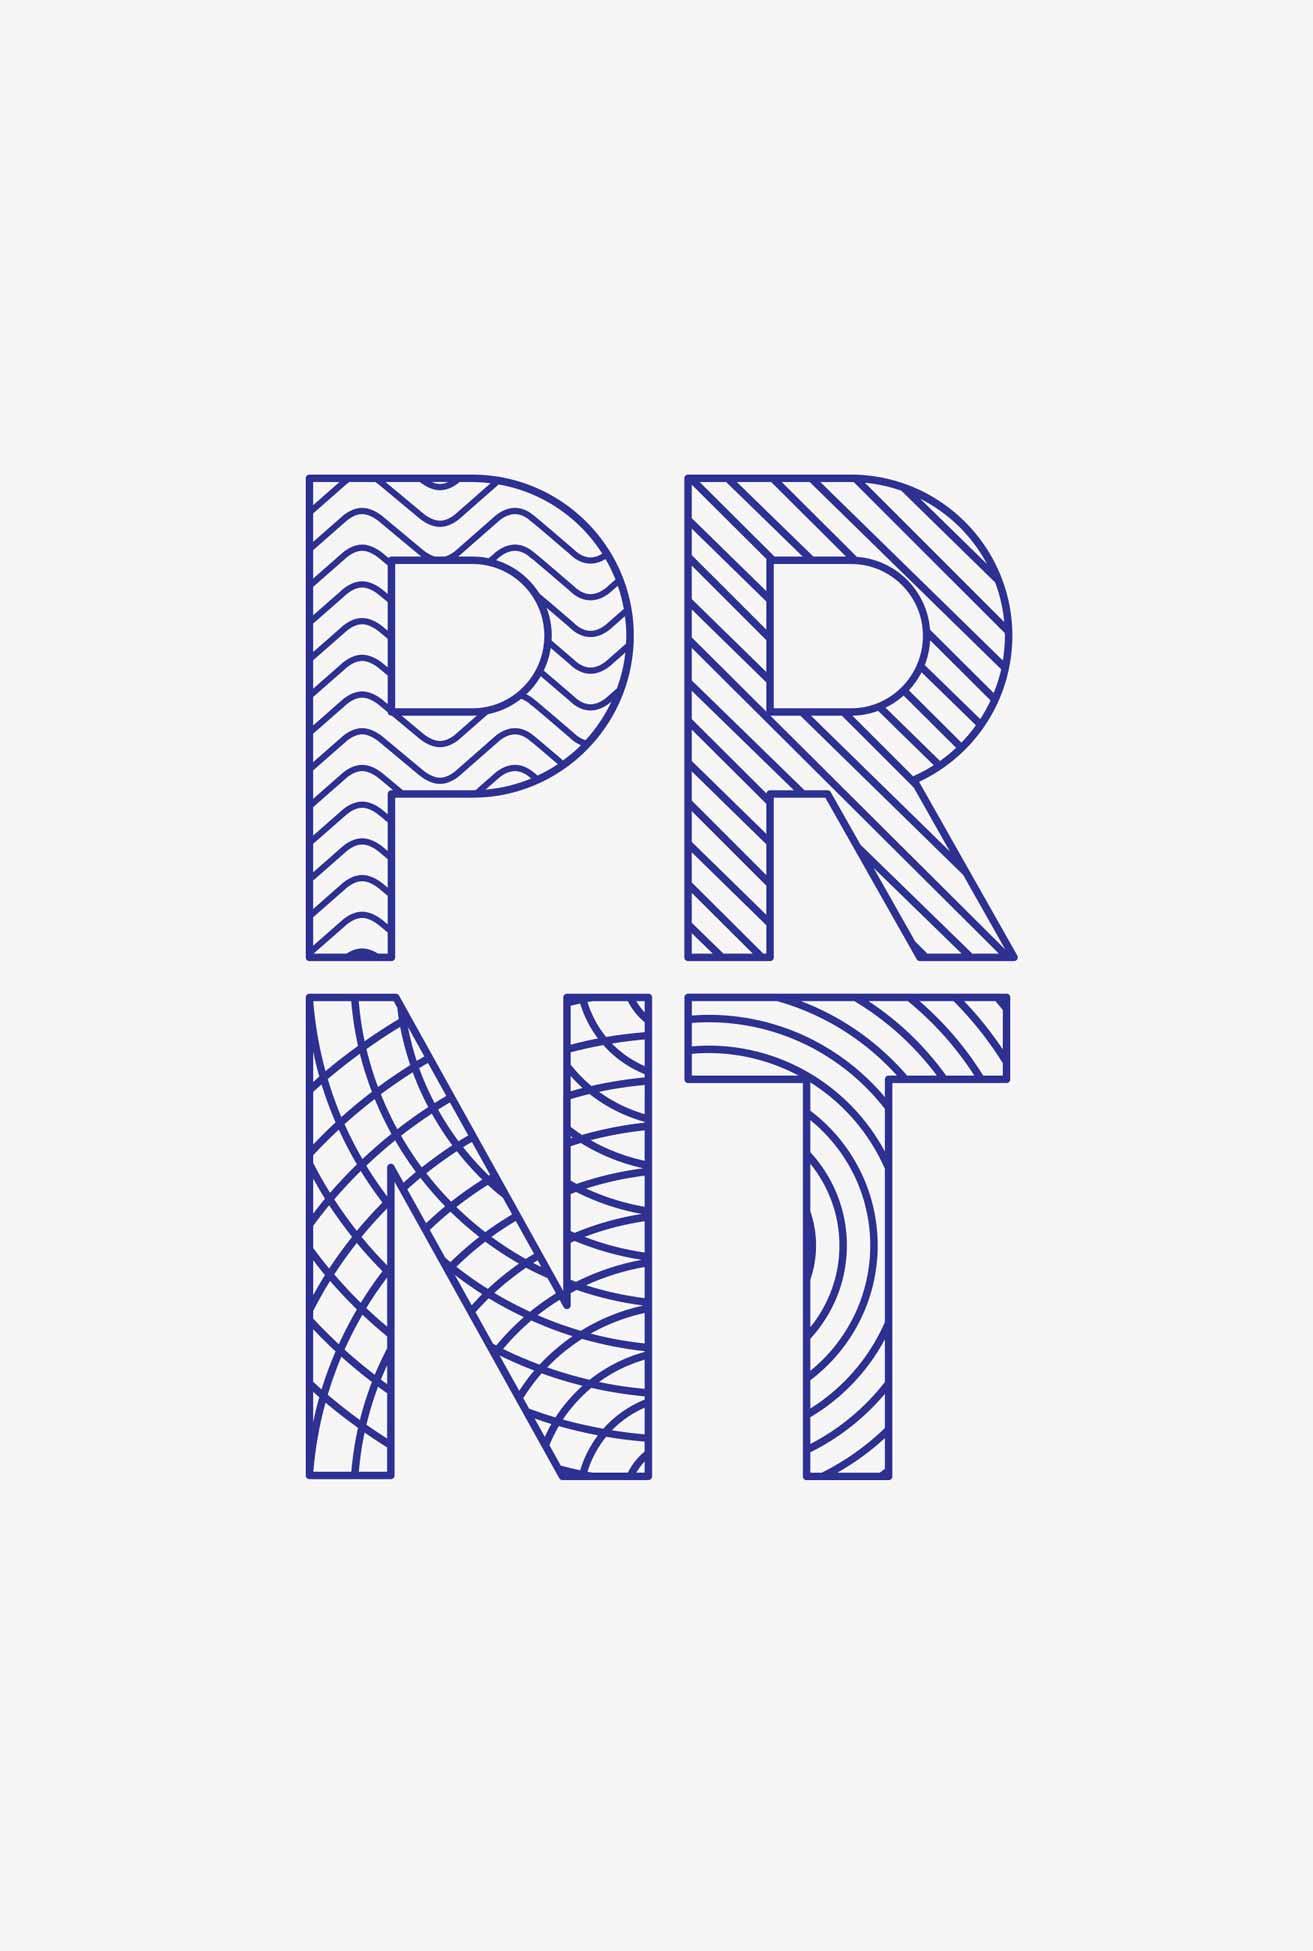 PRNT-vert_stacked.jpg